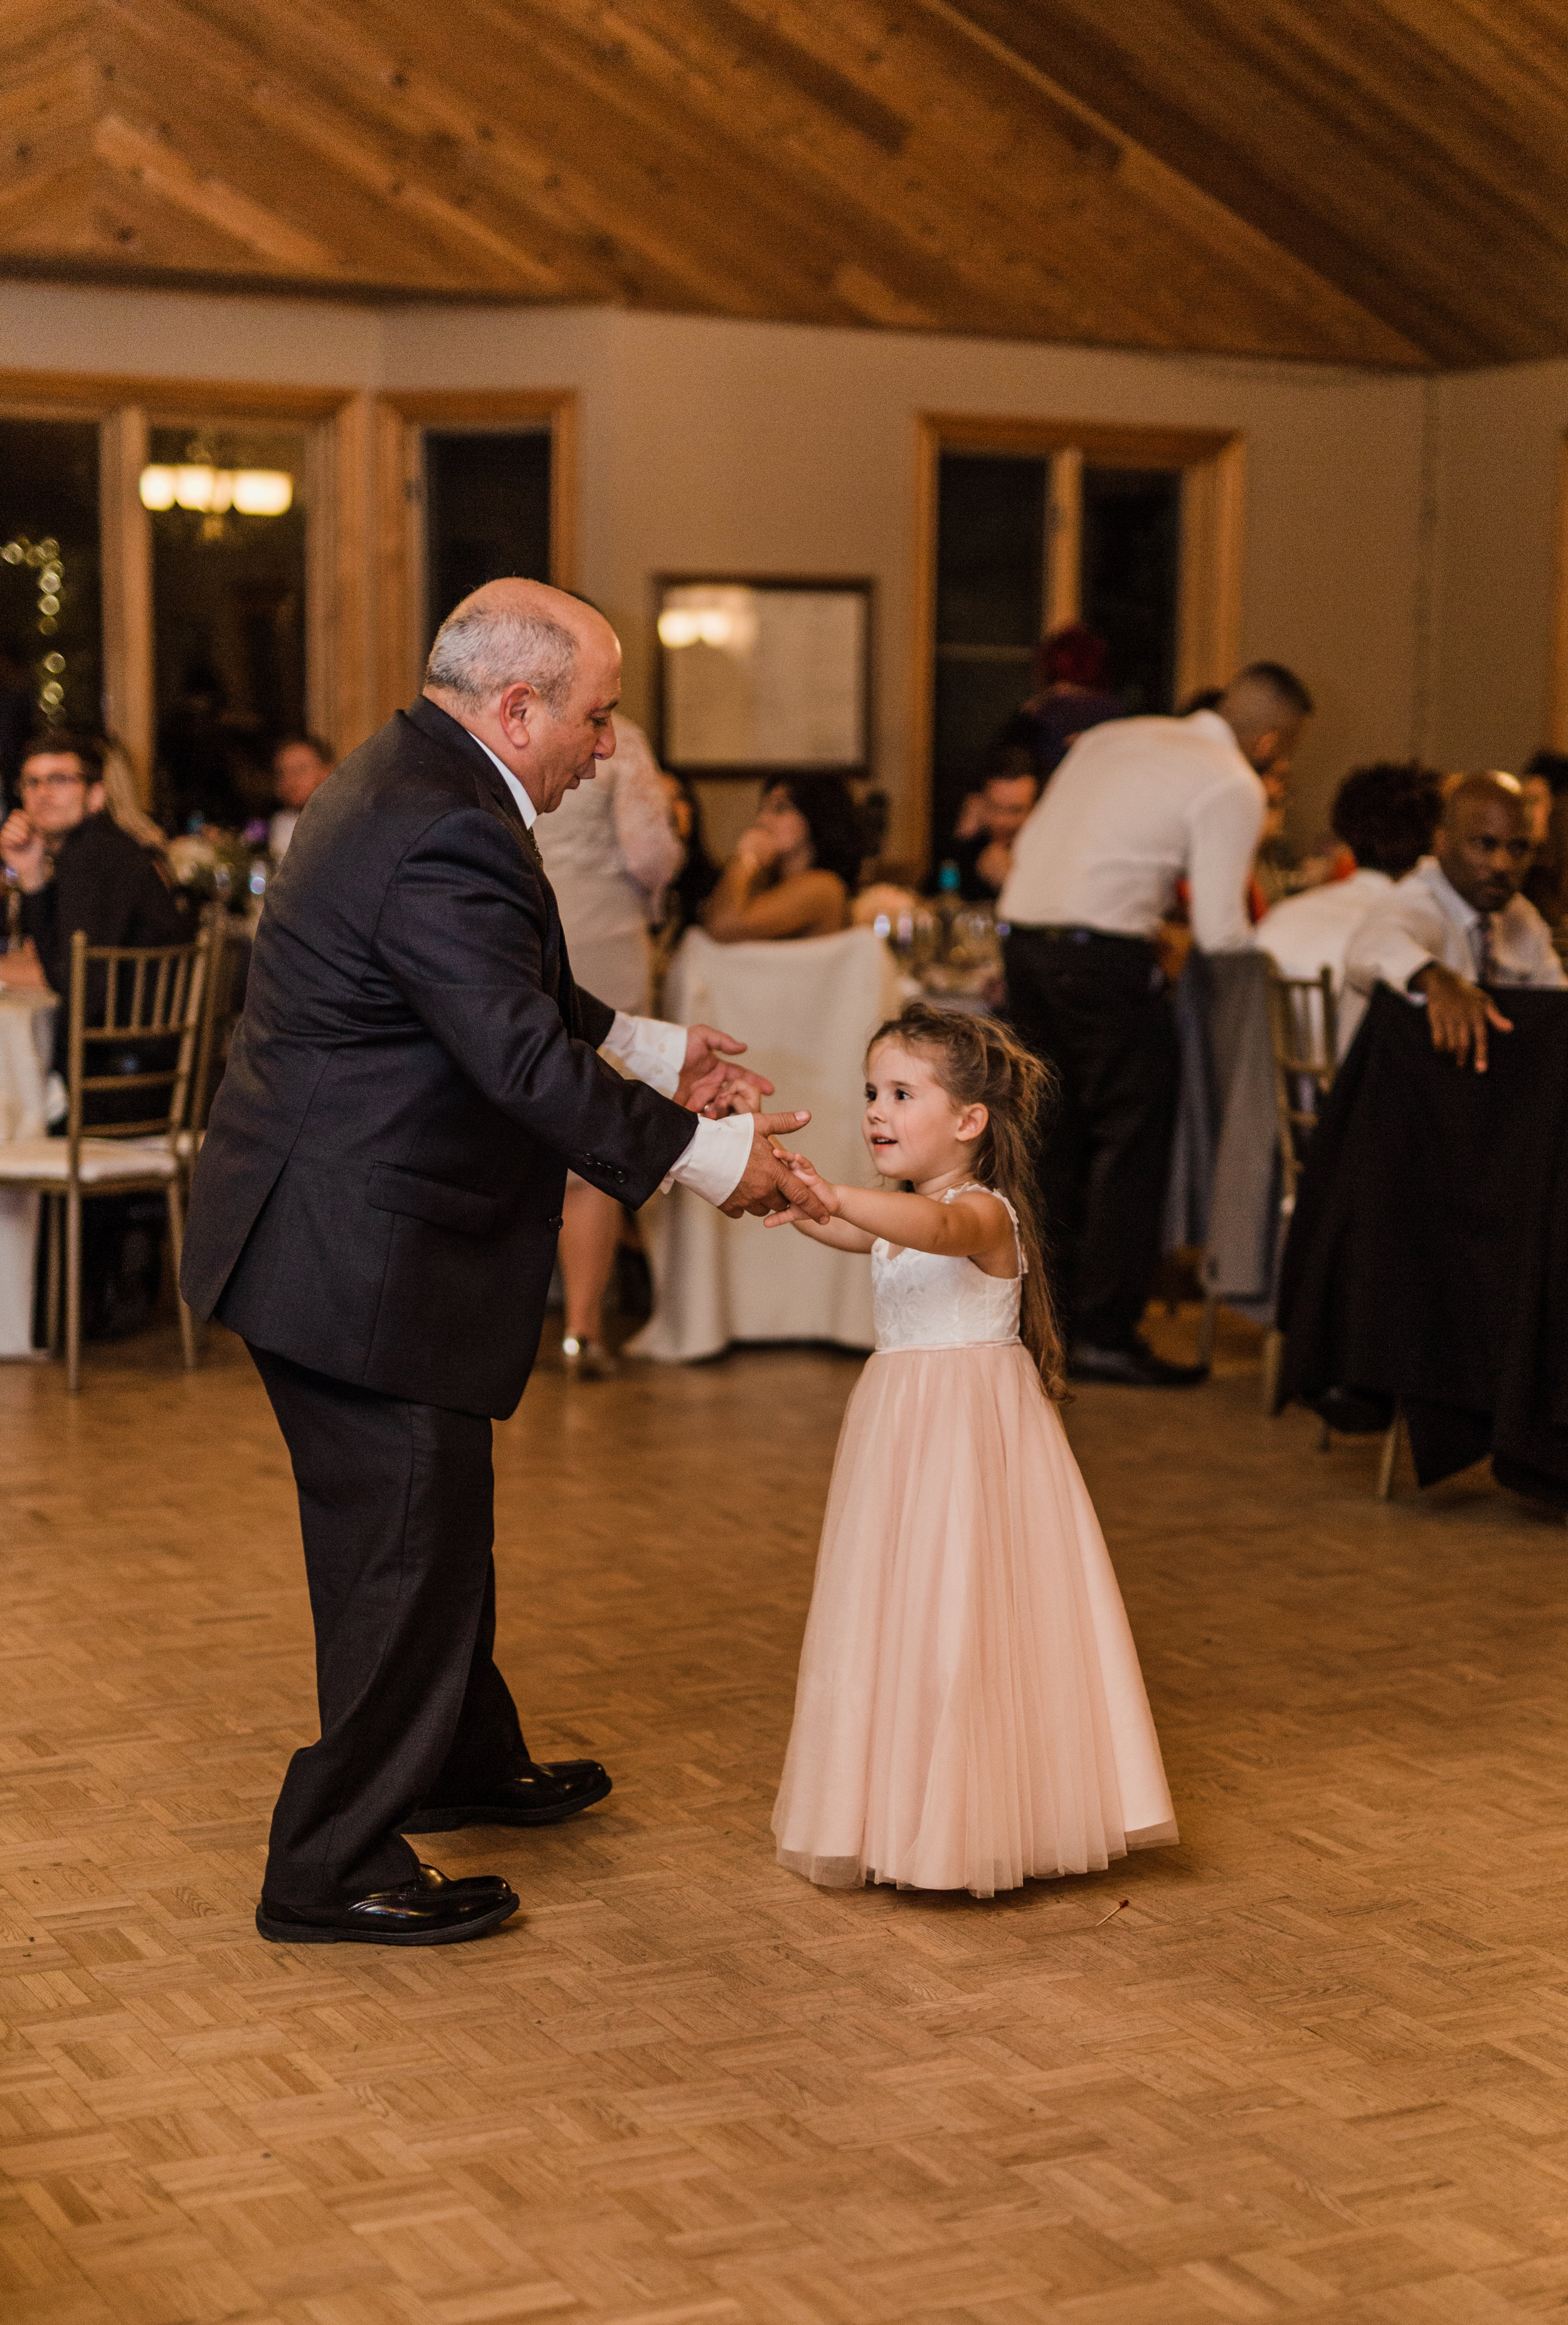 Amir-Golbazi-Danielle-Giroux-Photography_Toronto-Wedding_Cedarwood_Rachel-Paul_754.jpg